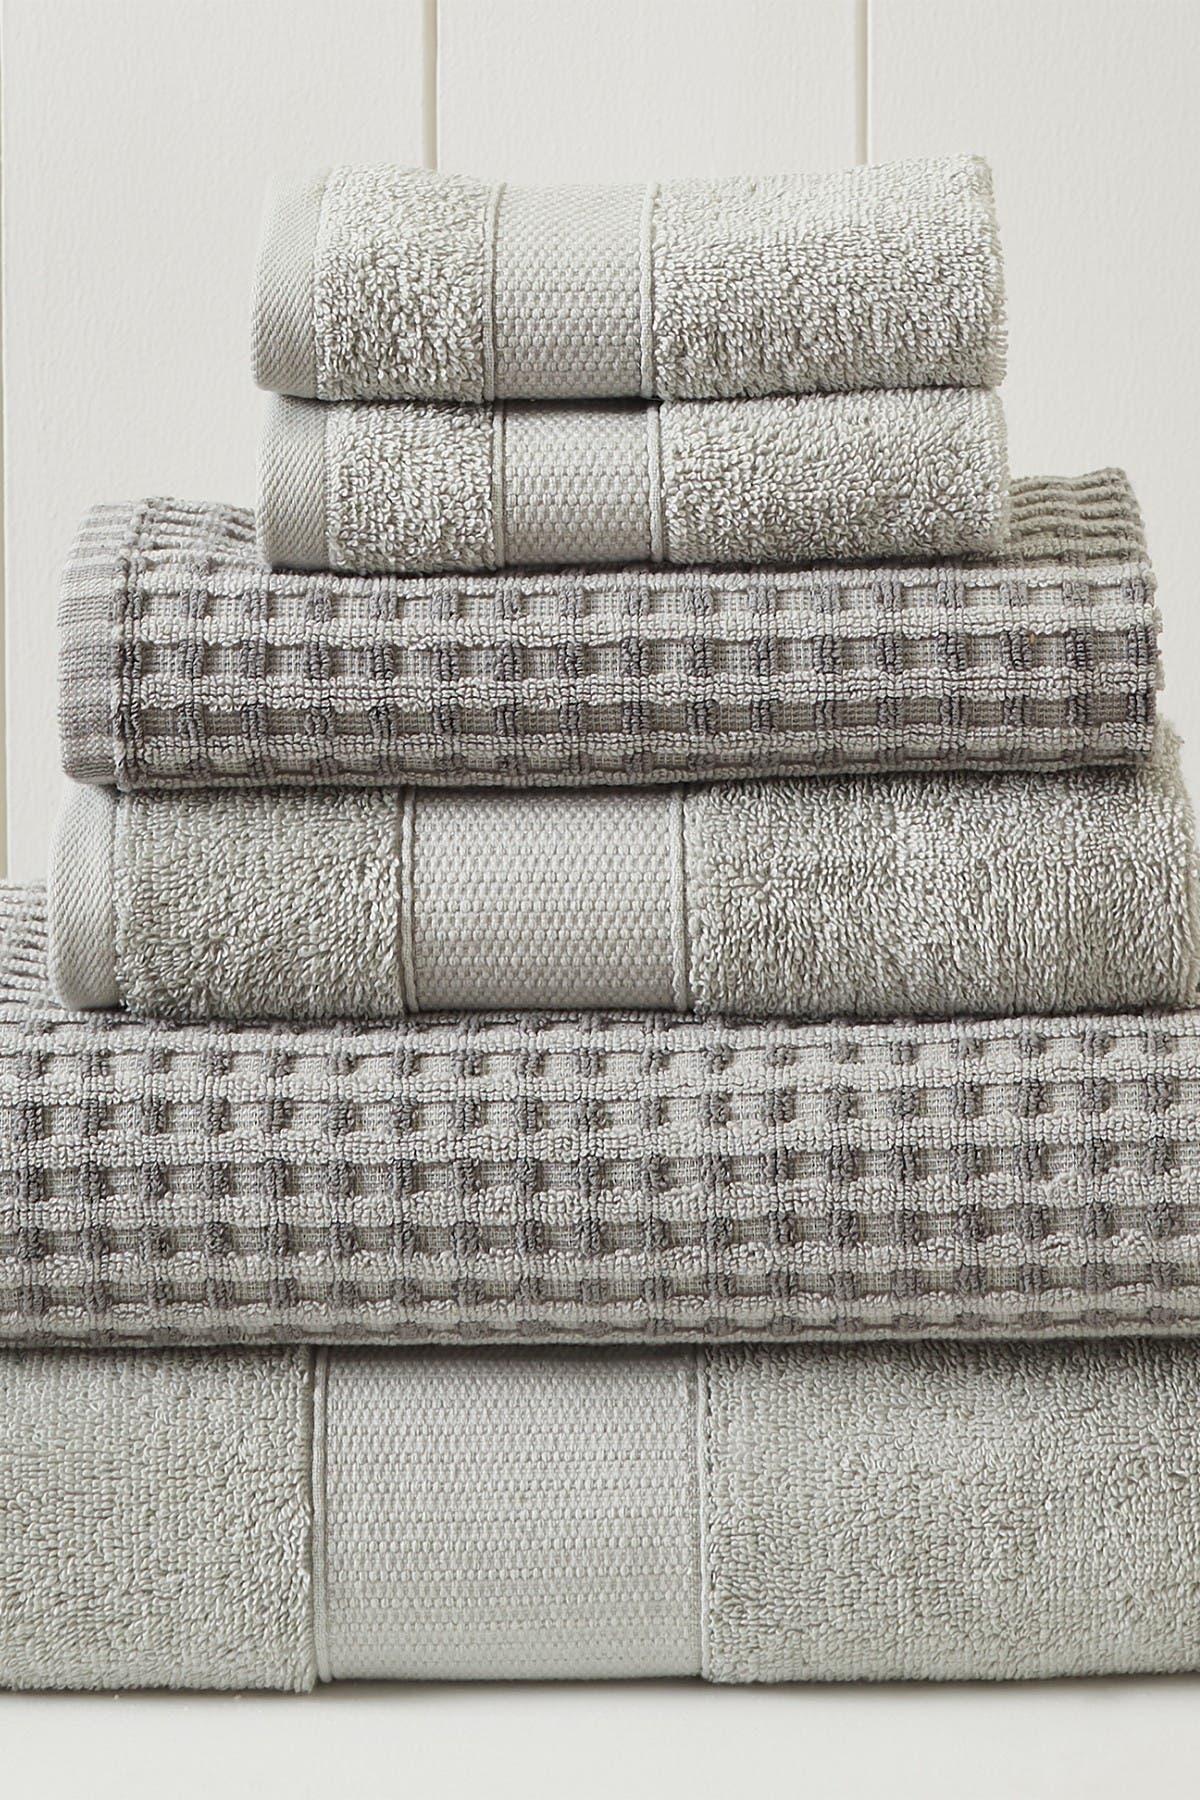 Image of Modern Threads Luxury Spa Cobblestone Quick Dry 6-Piece Towel Set - Silver